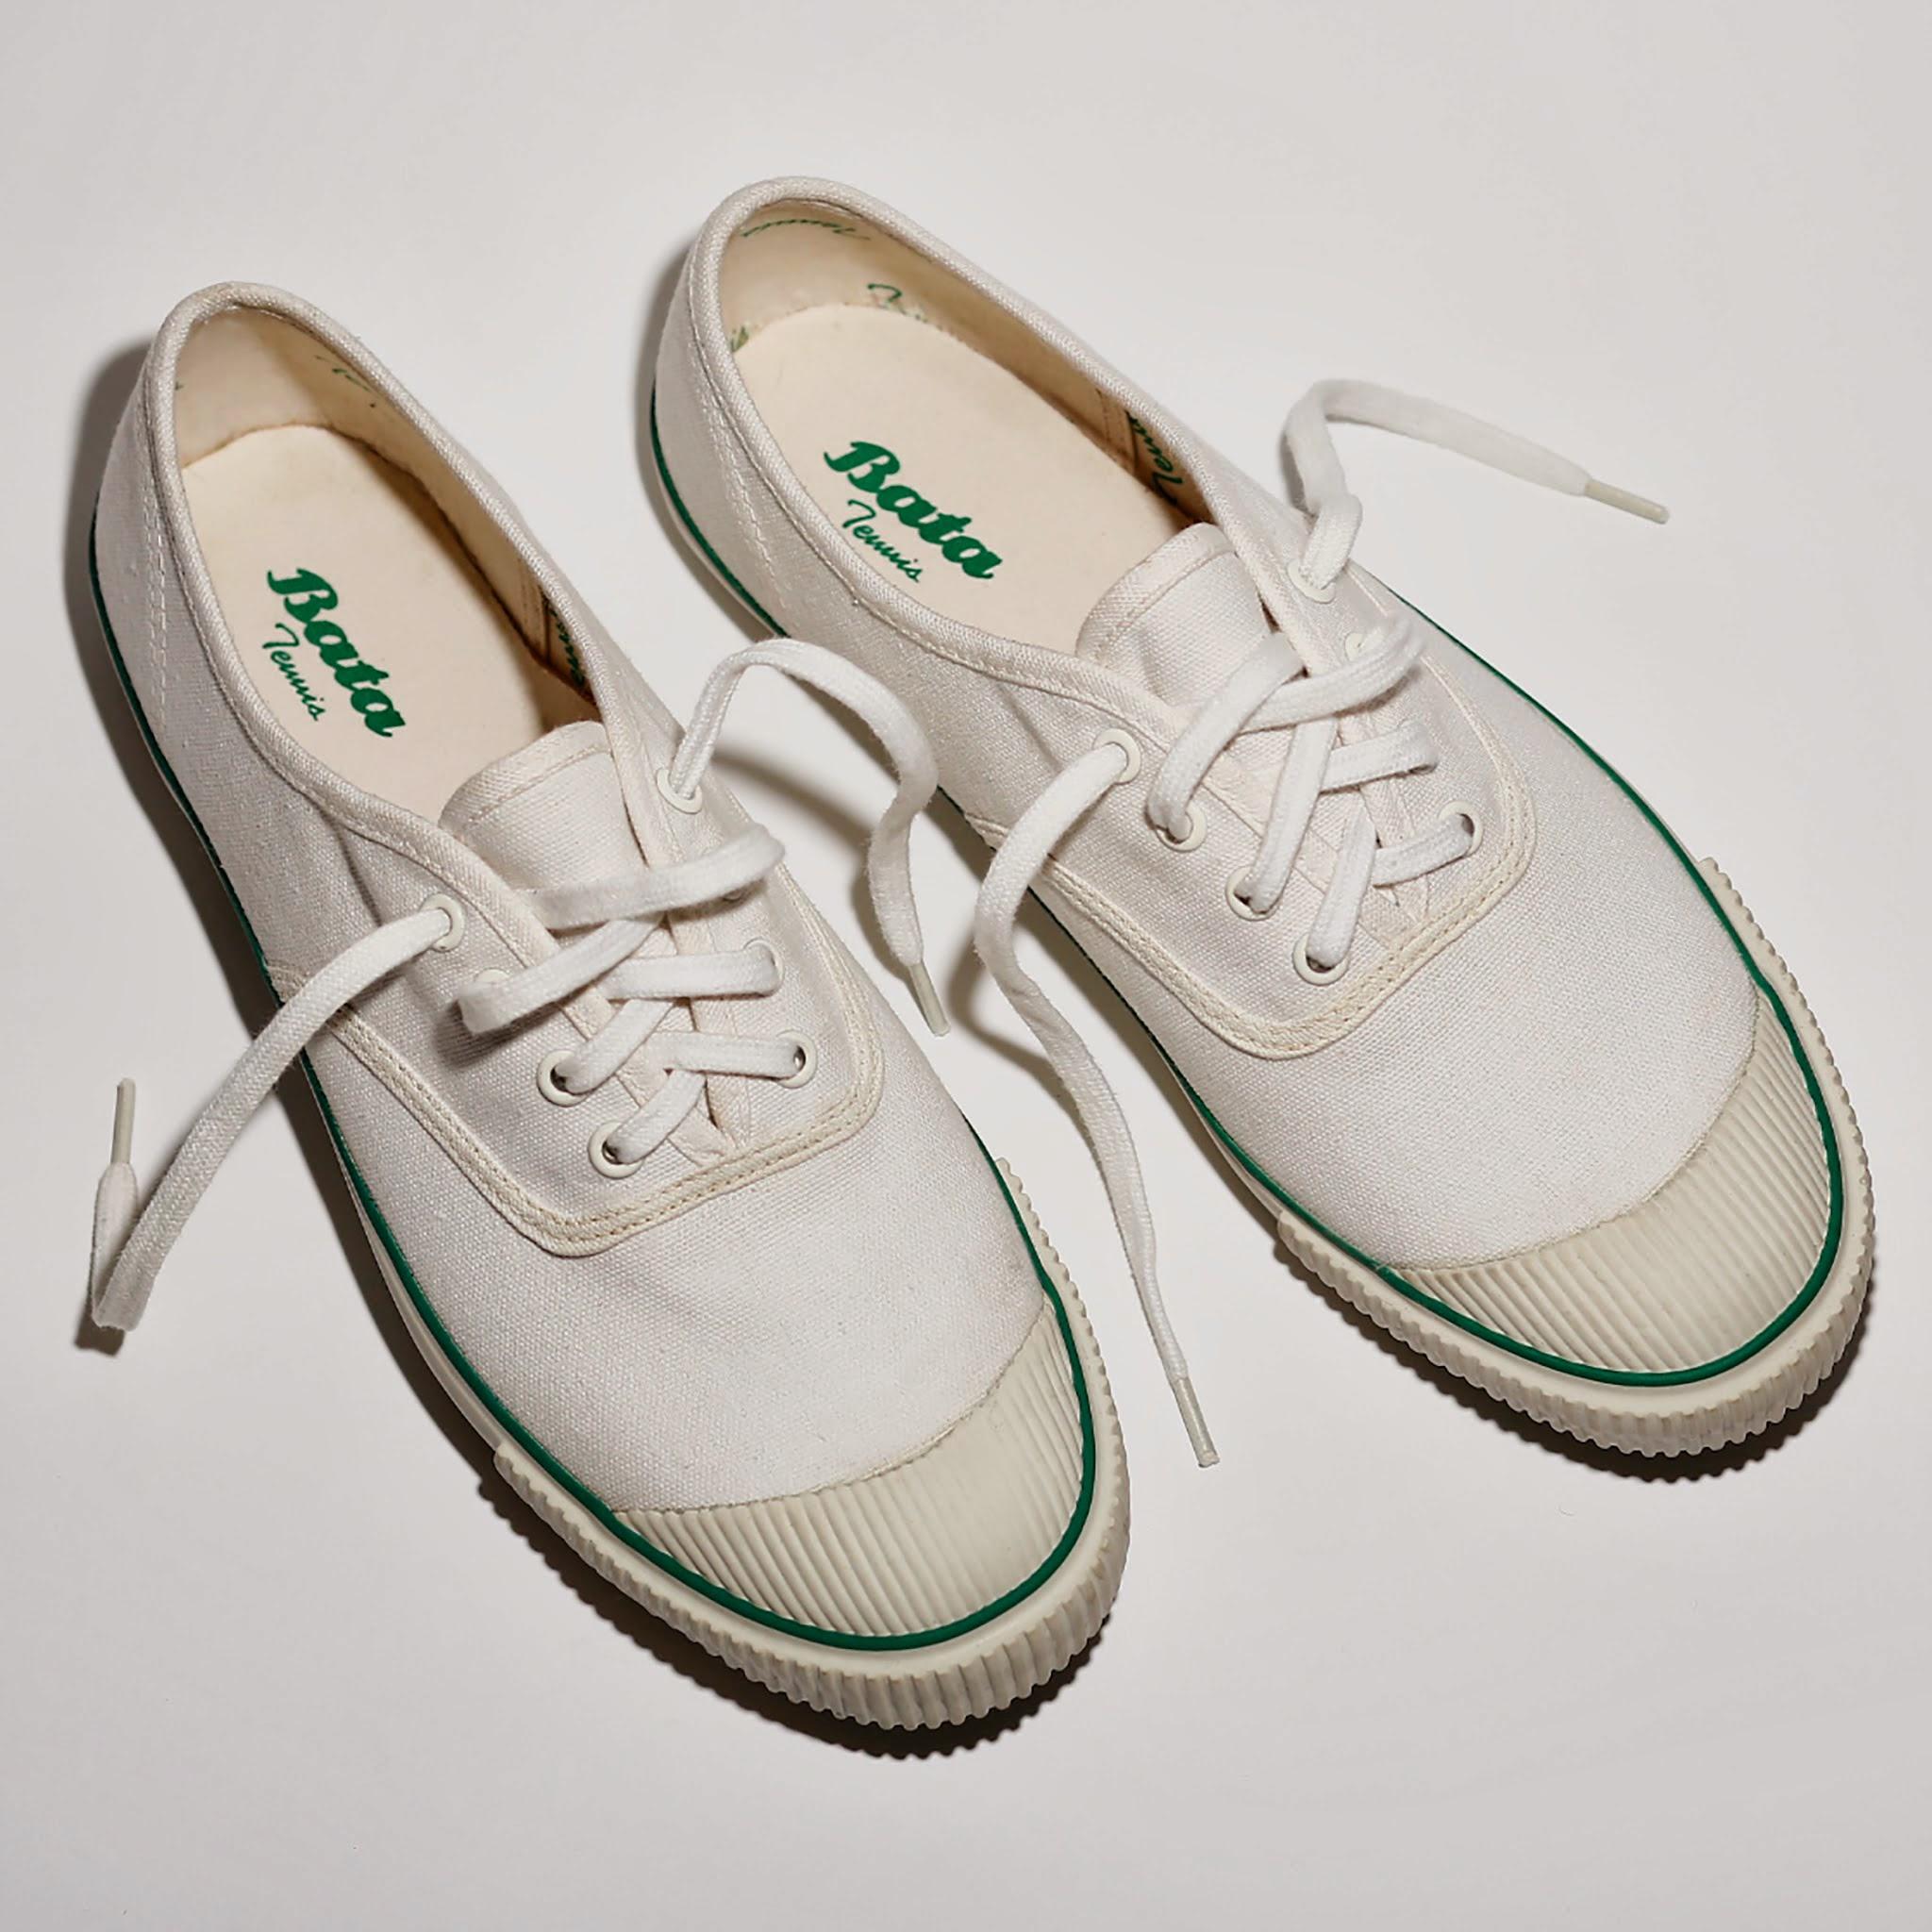 Quality Children S Shoe Brands